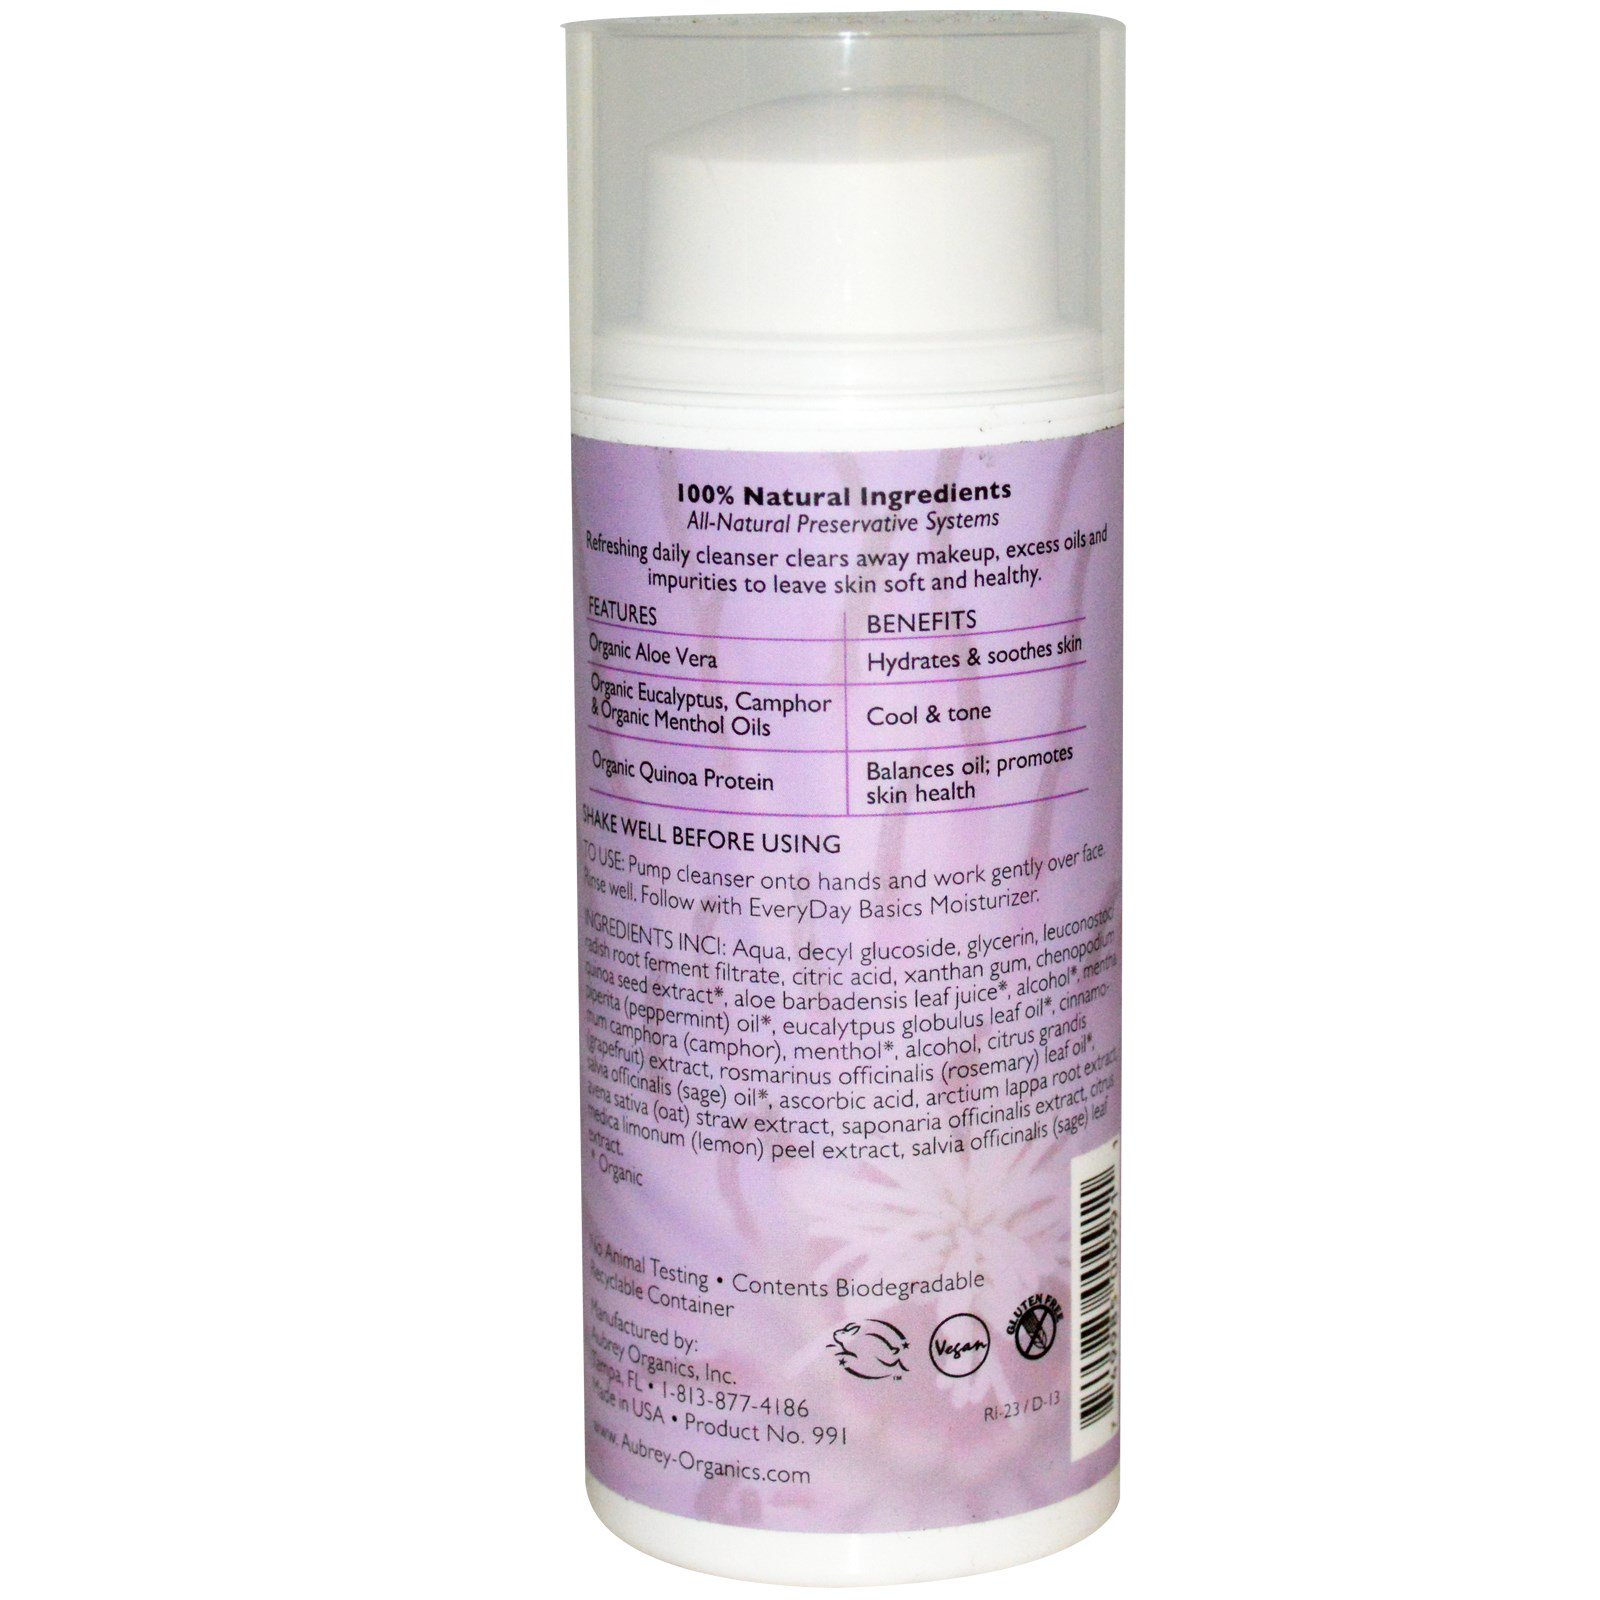 EveryDay Basics Cleansing Gel For Normal/Oily Skin - 3.4 fl. oz. by Aubrey Organics (pack of 12 ) 2 Pack - Dermalogica Age Smart Skin Perfect Primer  0.75 oz